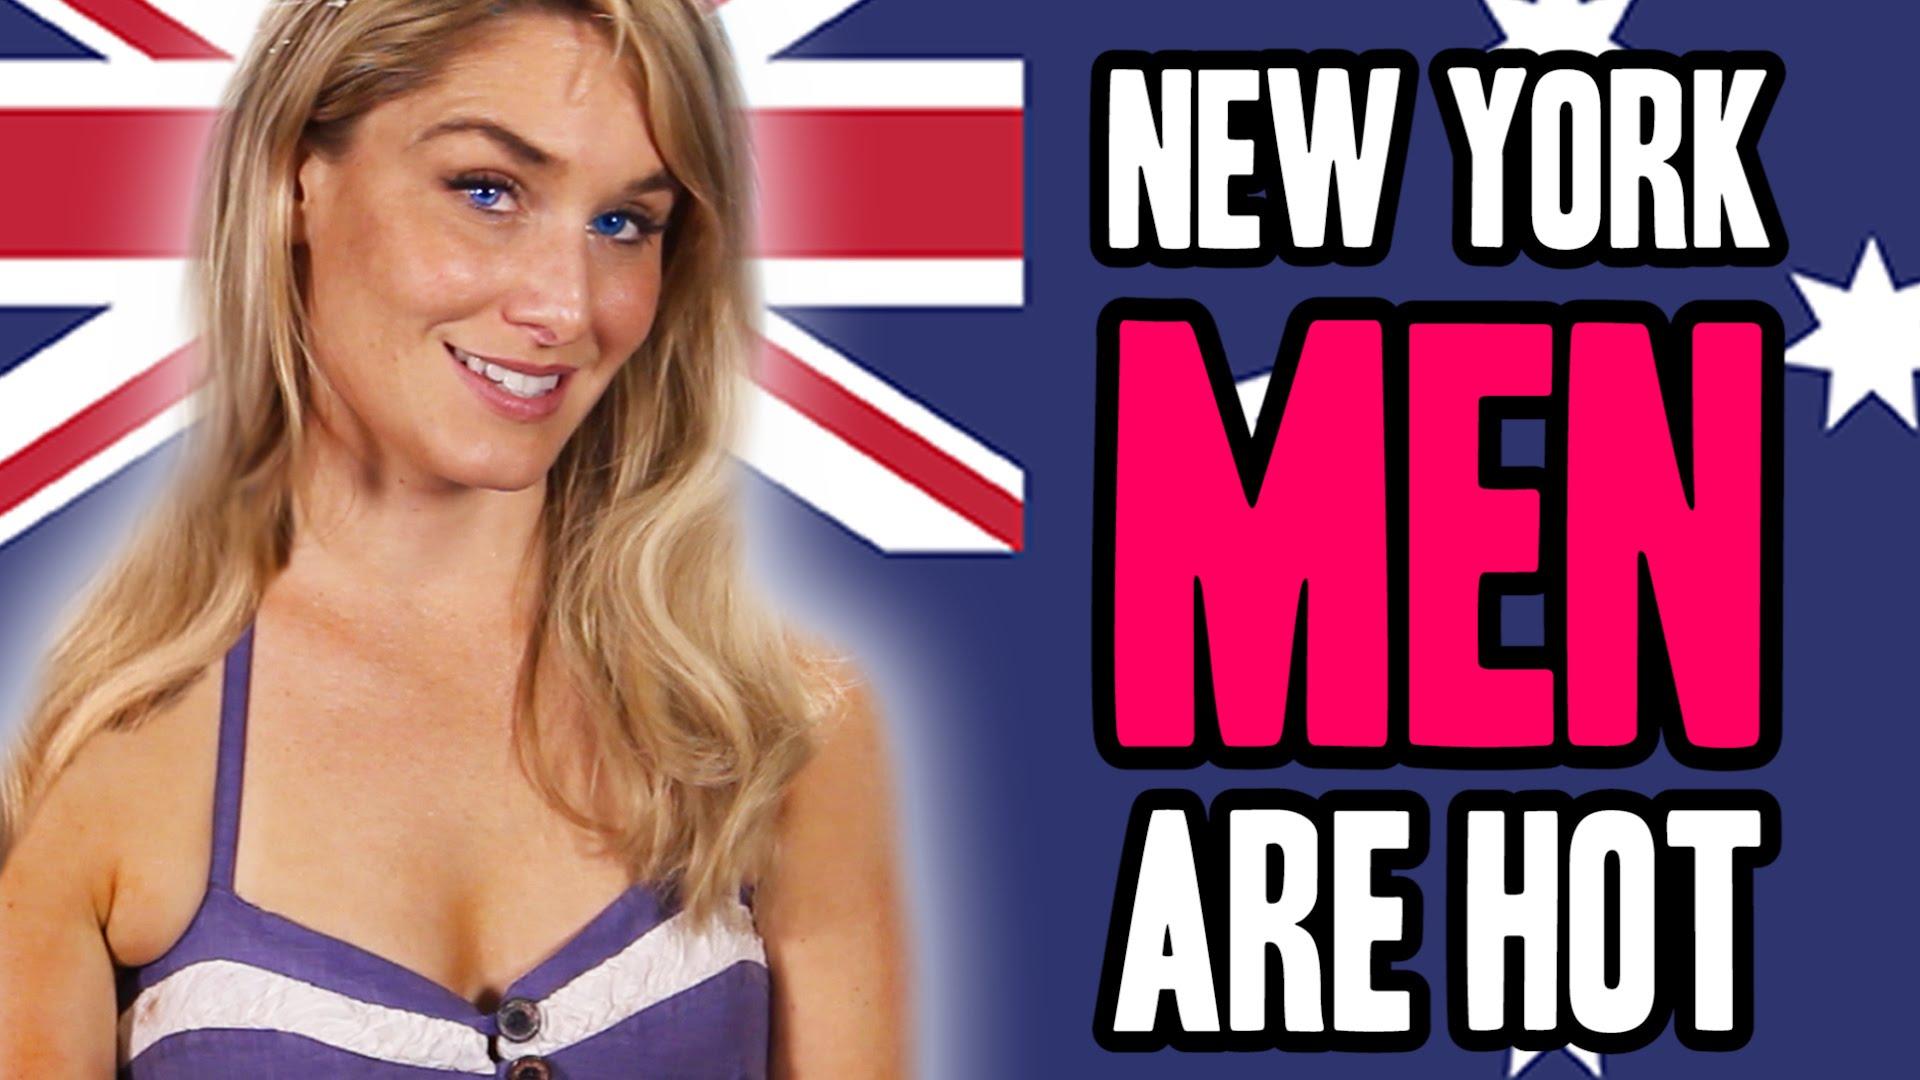 British girl dating american guy